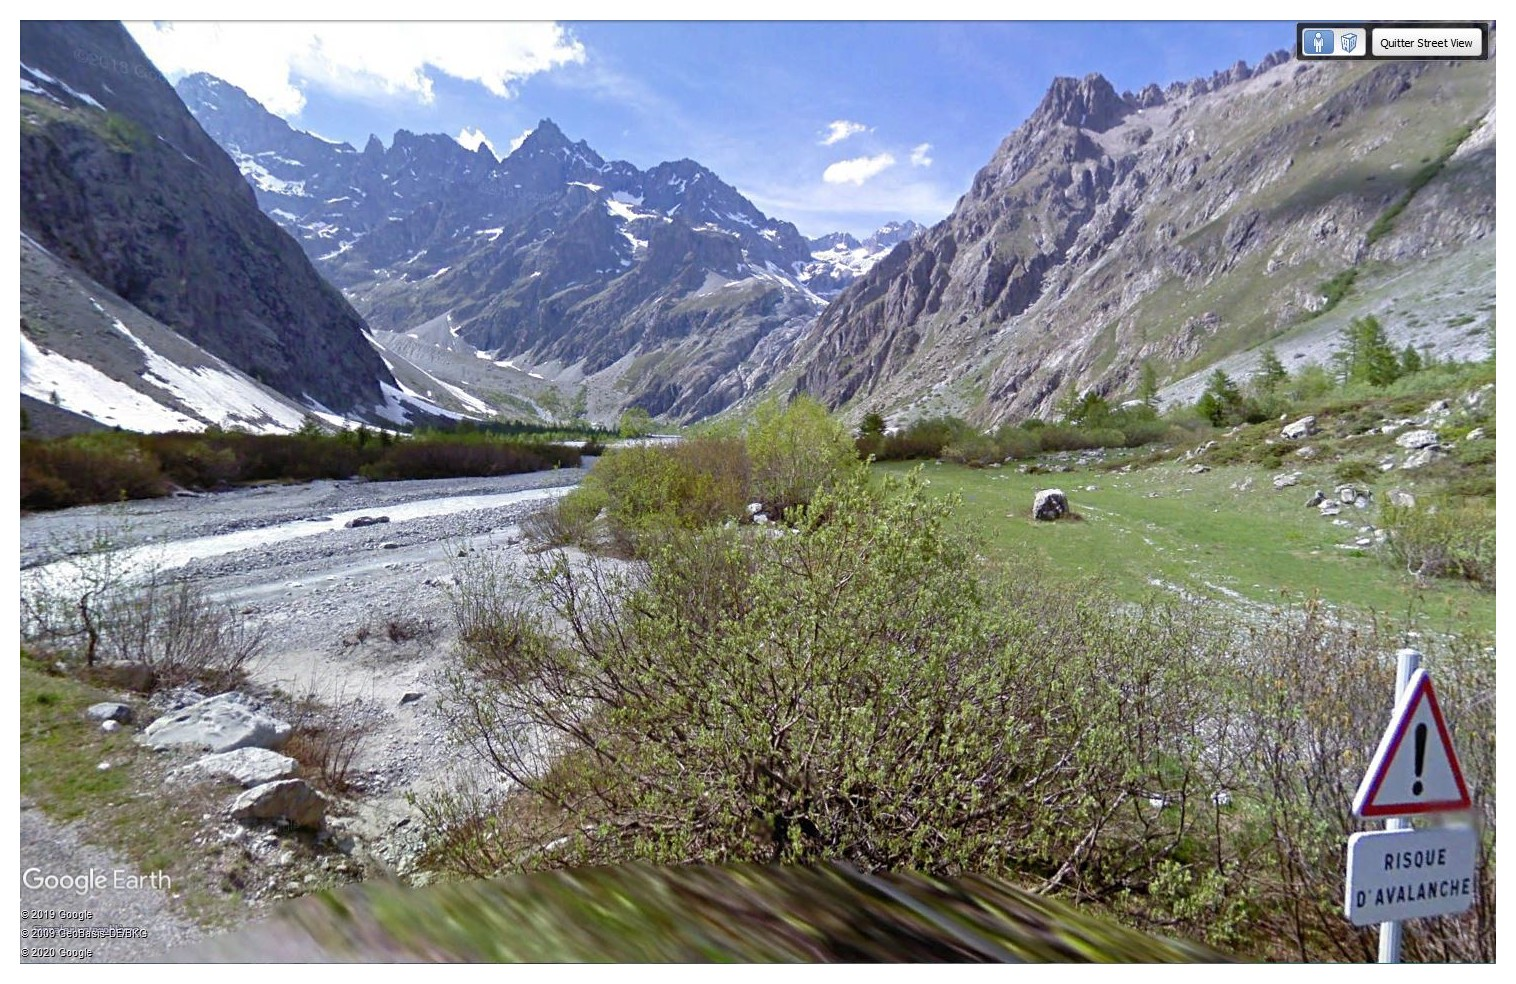 STREET VIEW : les cartes postales de Google Earth - Page 71 Tsge1063